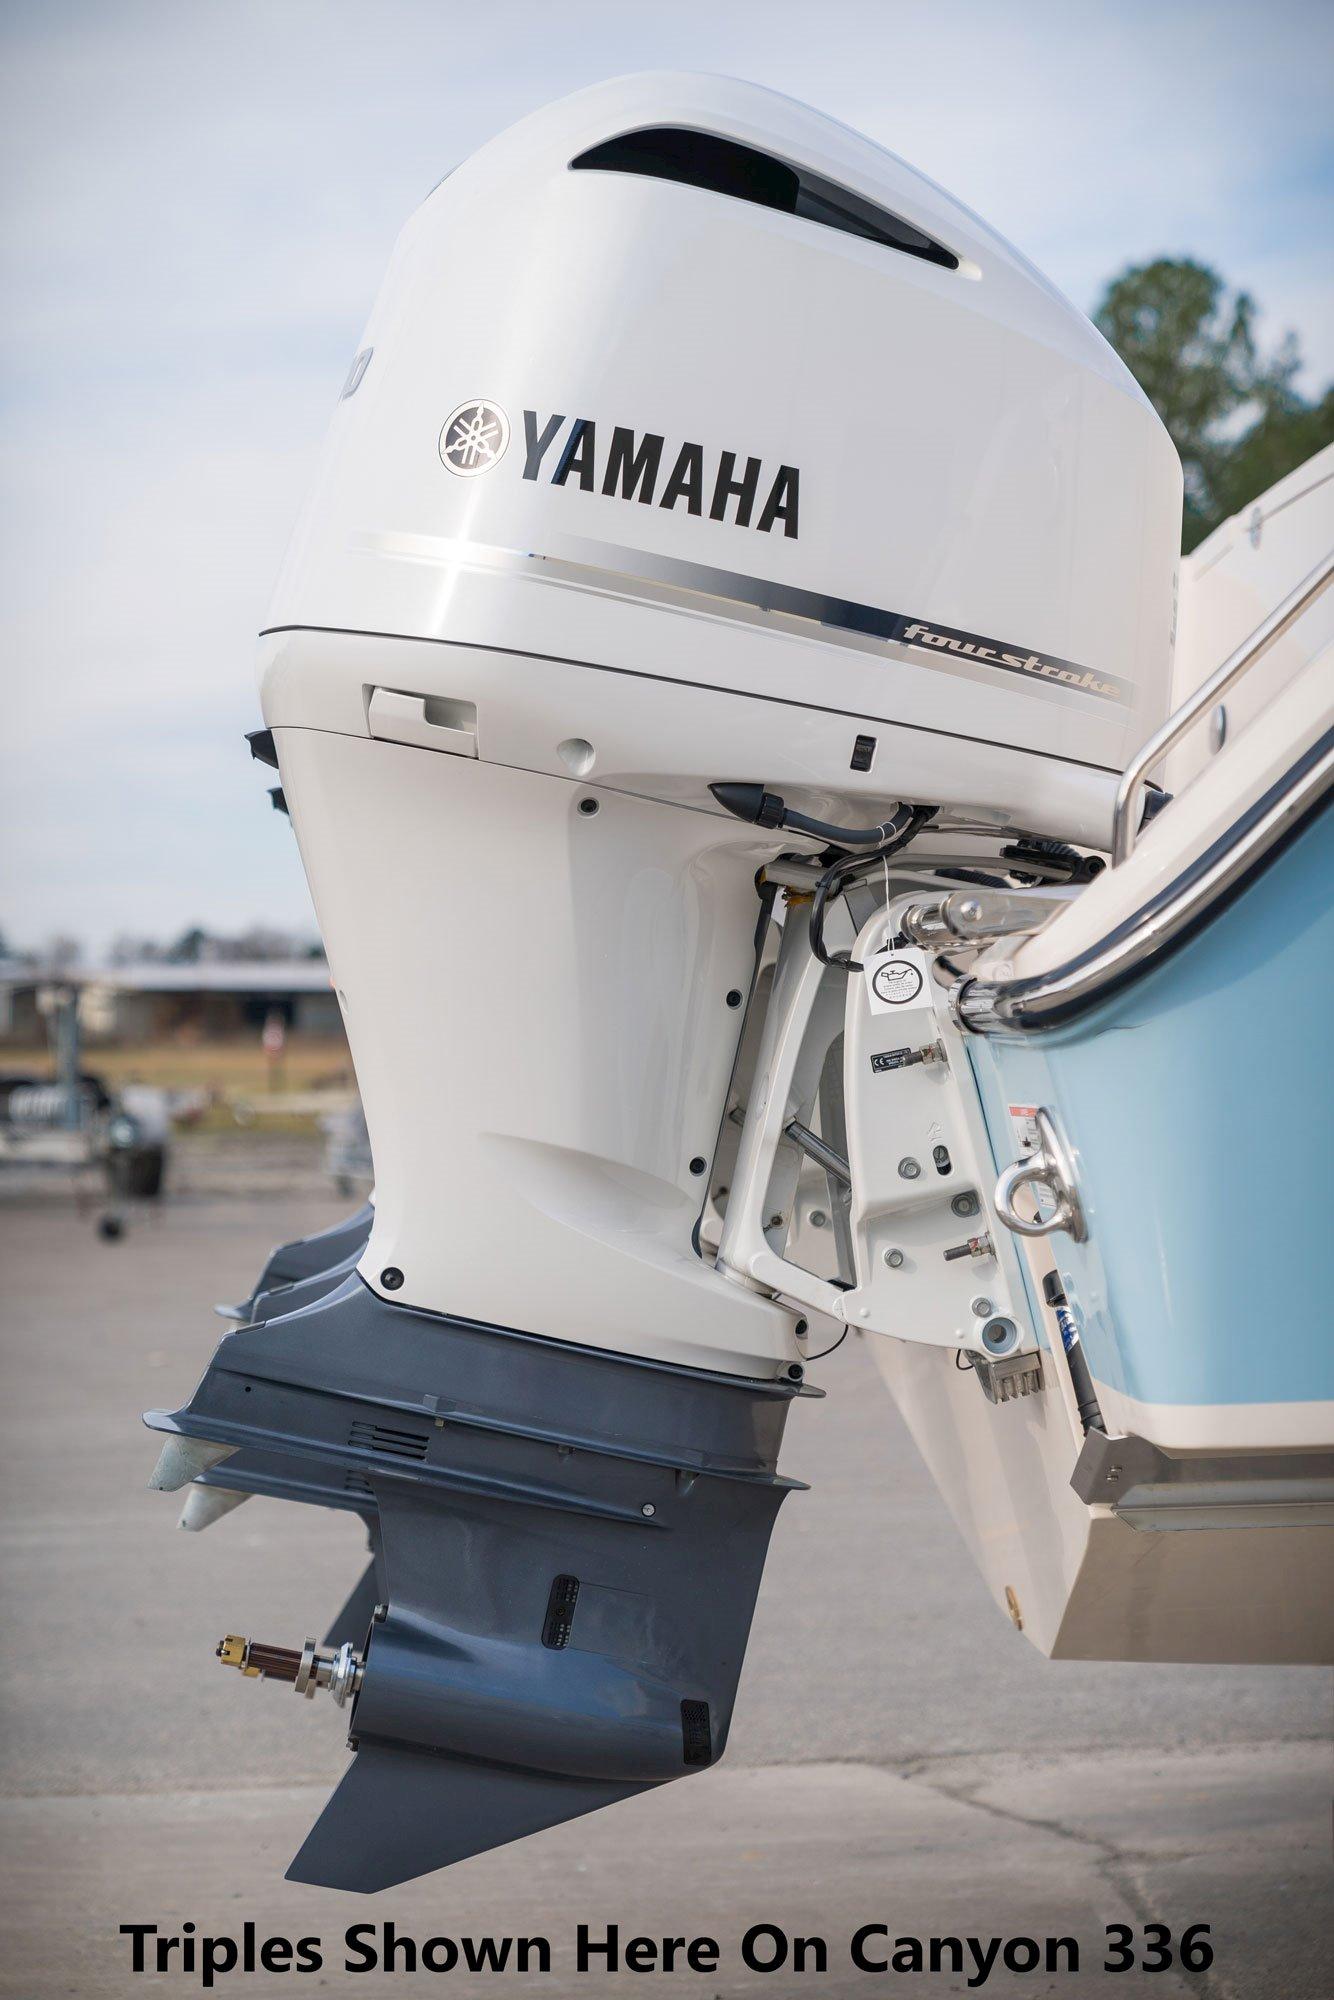 Grady-White Marlin 300 30 foot Walkaround Cabin Boat White Engines